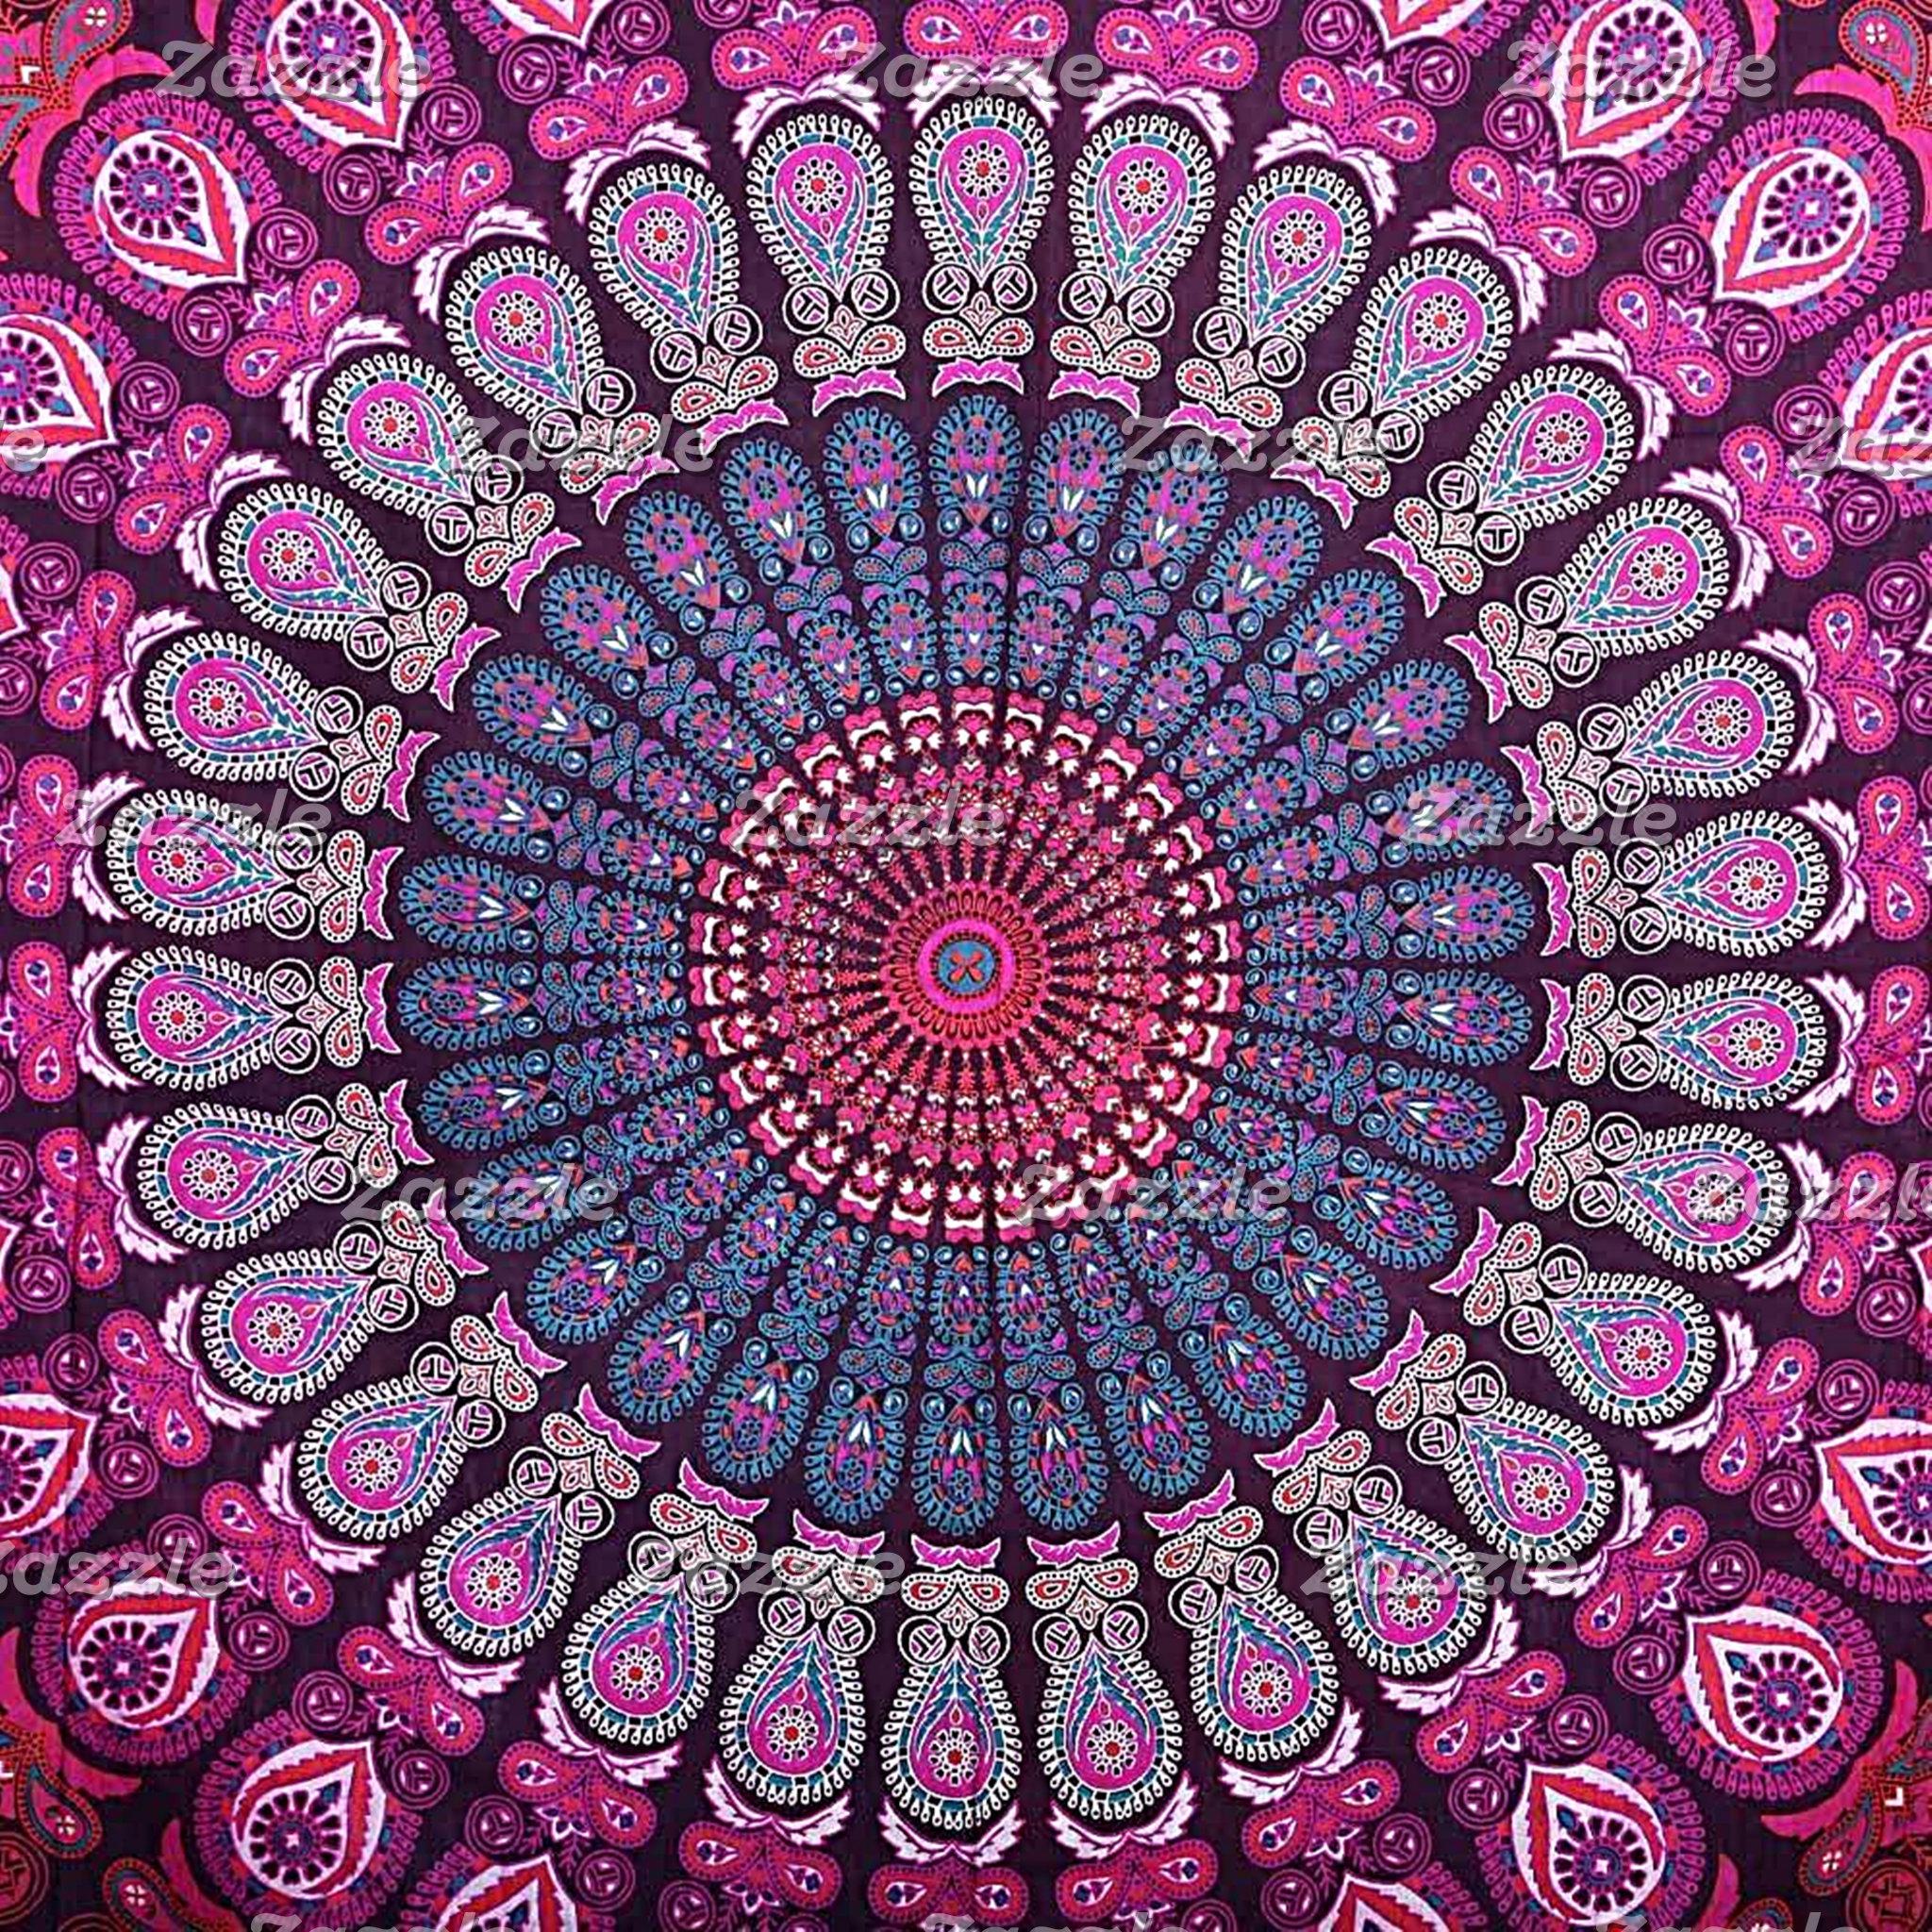 Psychedelic Designs